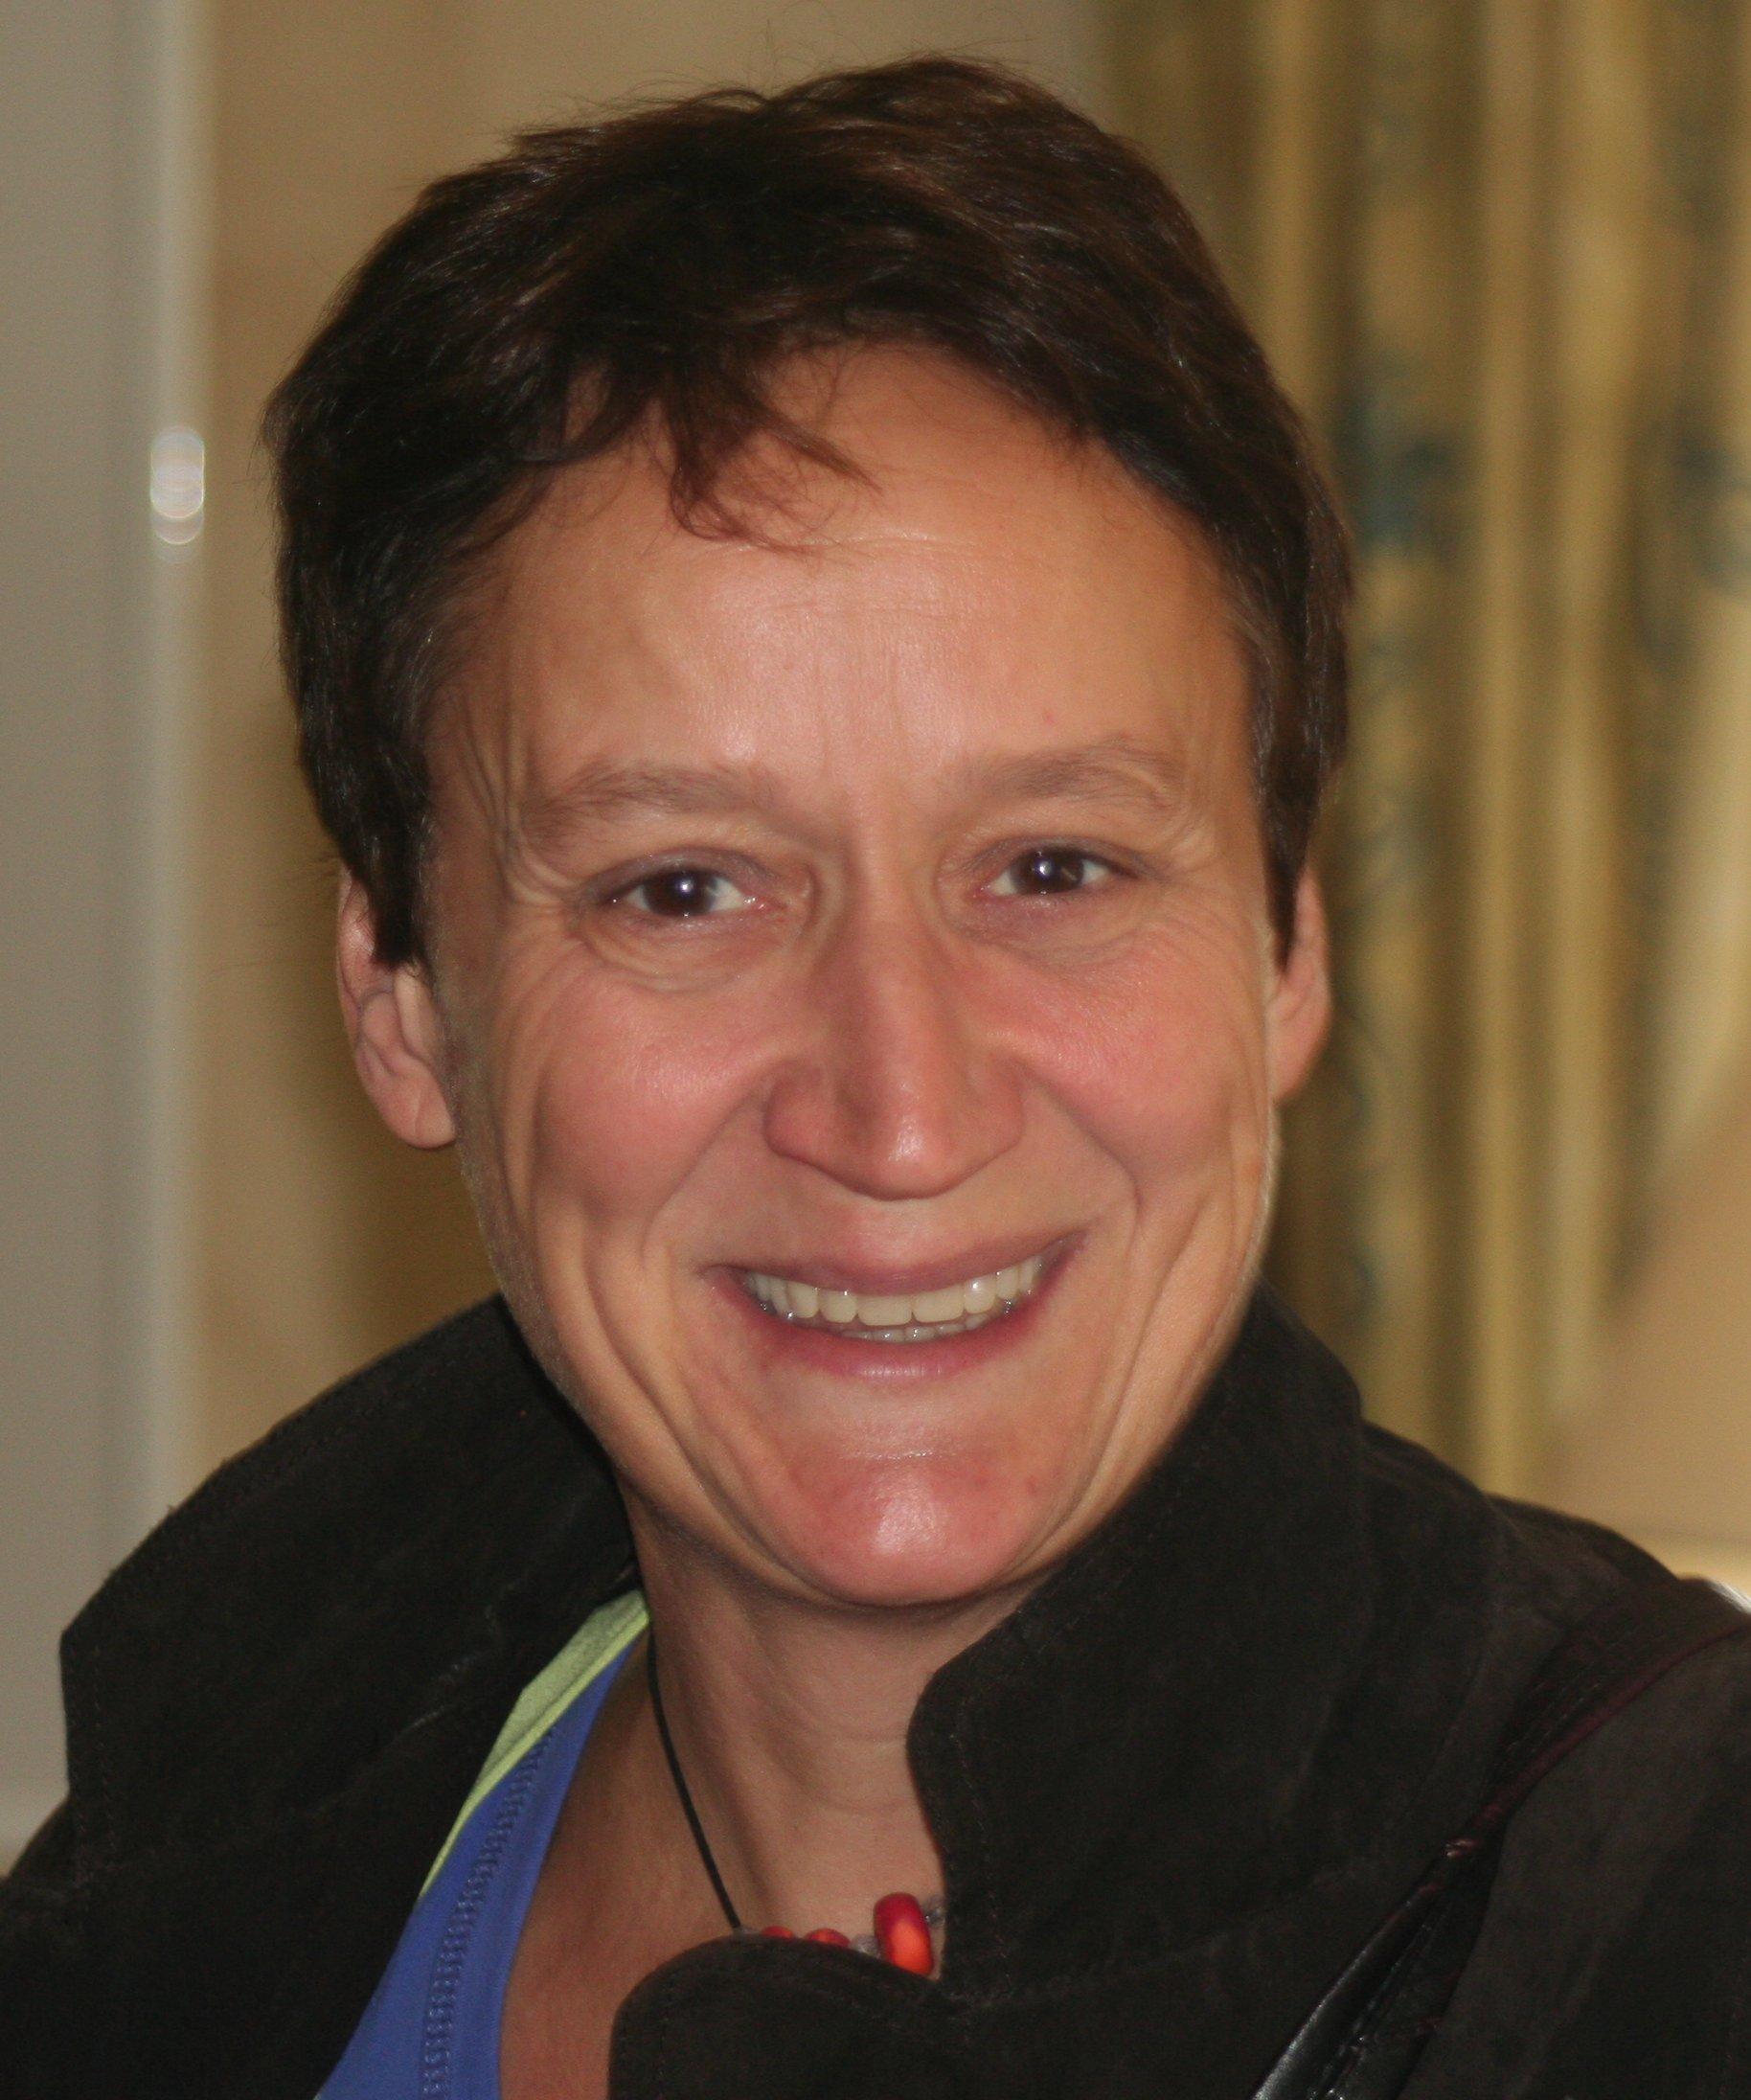 Dsm Keukens Goed : Hilde Delbecque – Voedselteams Goesting!